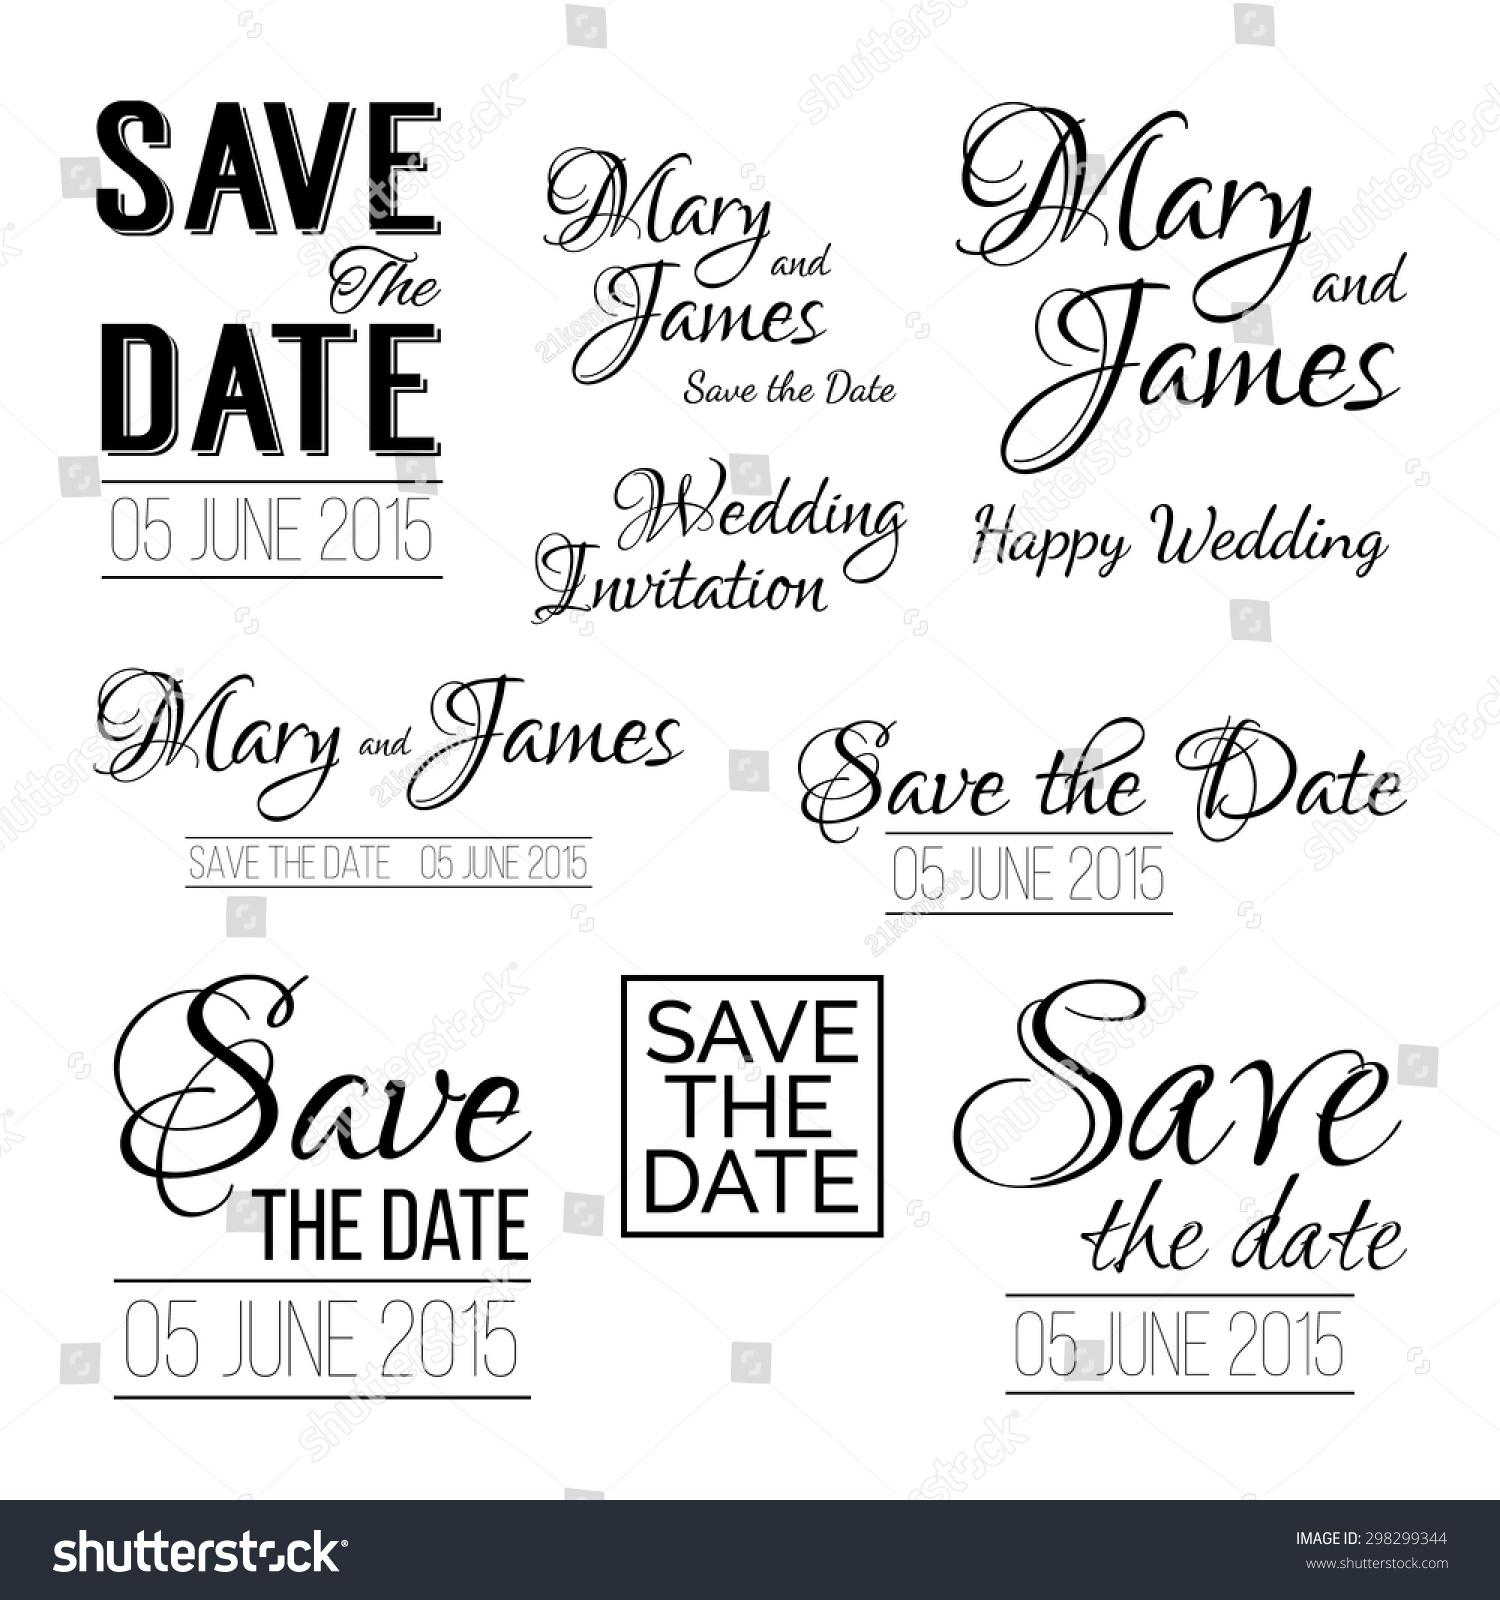 Save Date Logos Set Wedding Invitation Stock Vector 298299344